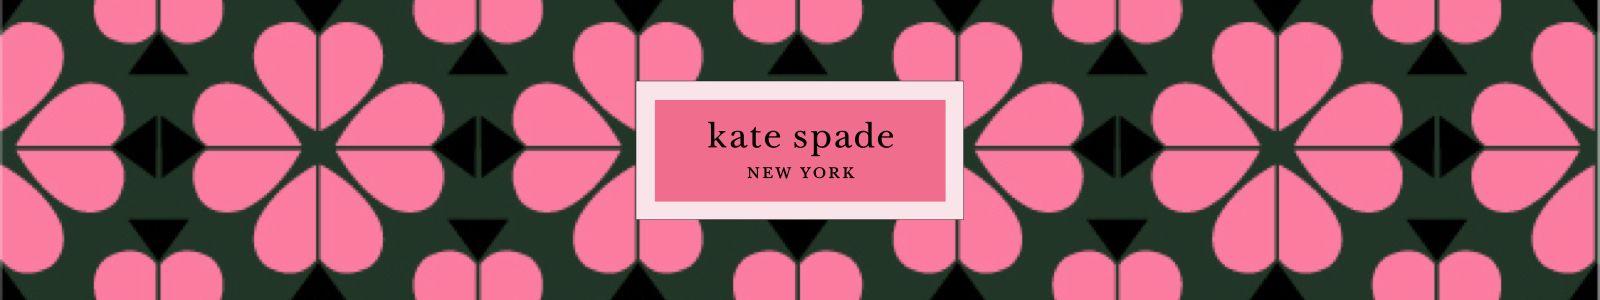 Kate spade, New York